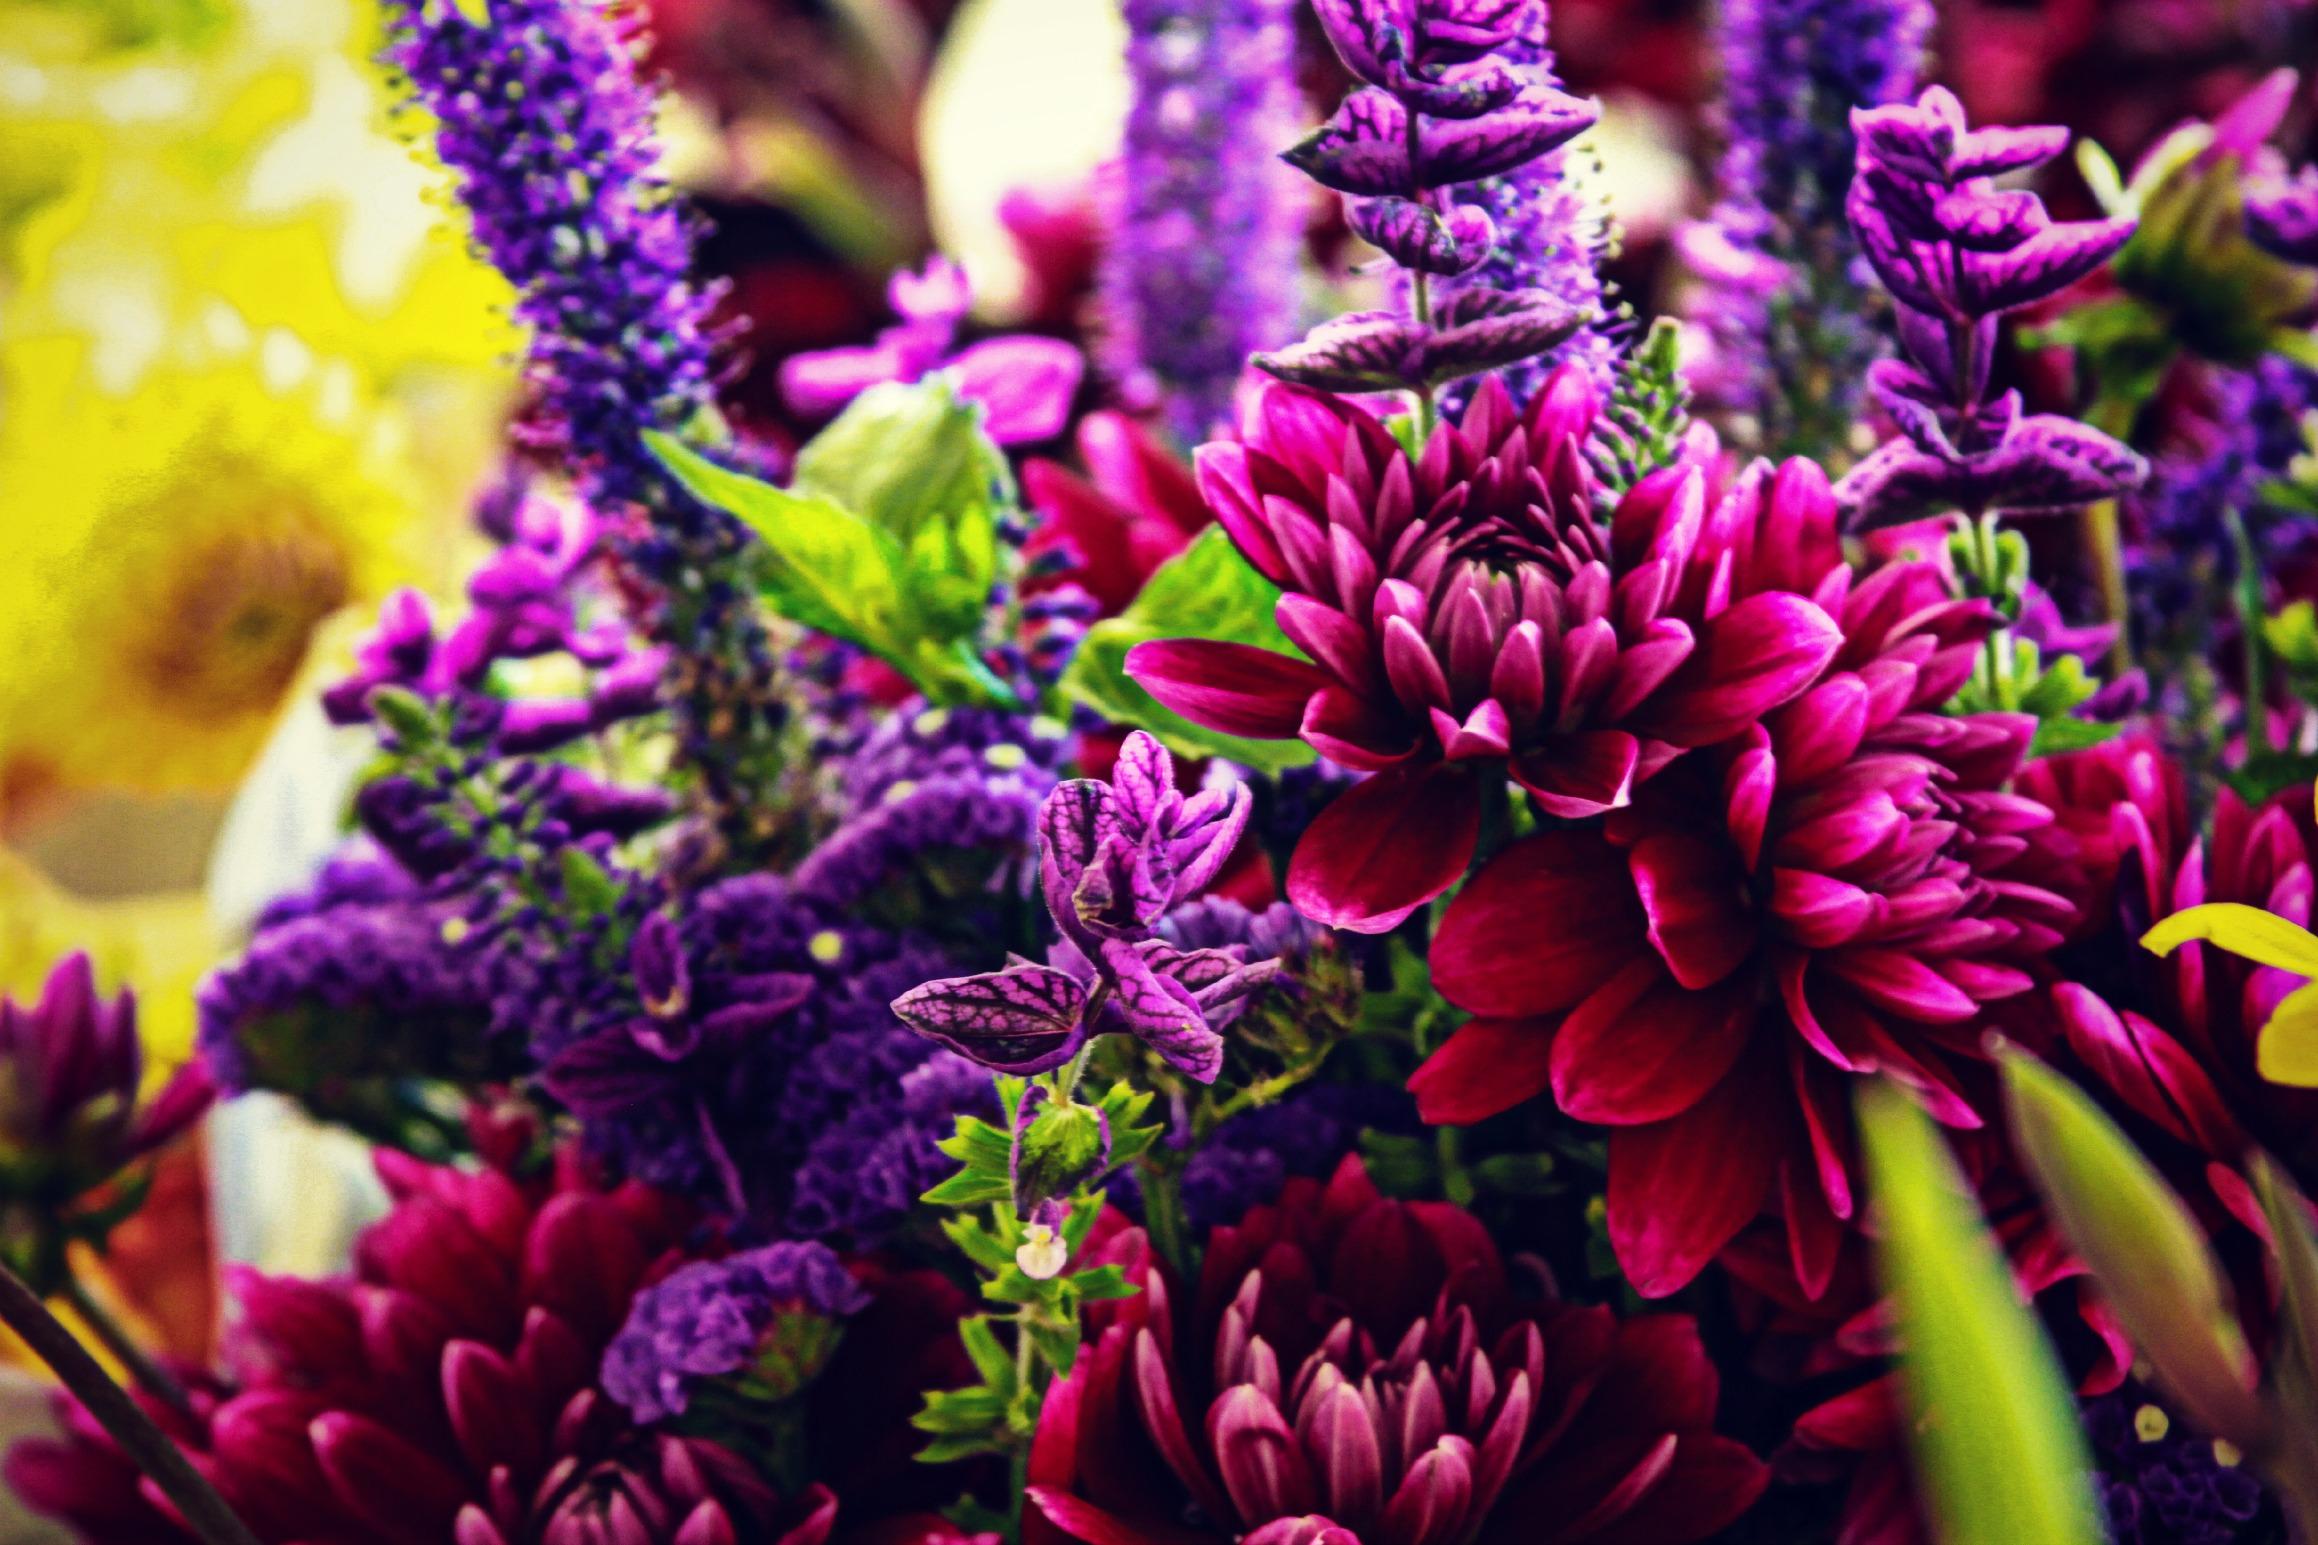 Vibrant Colors | Kolby Skidmore